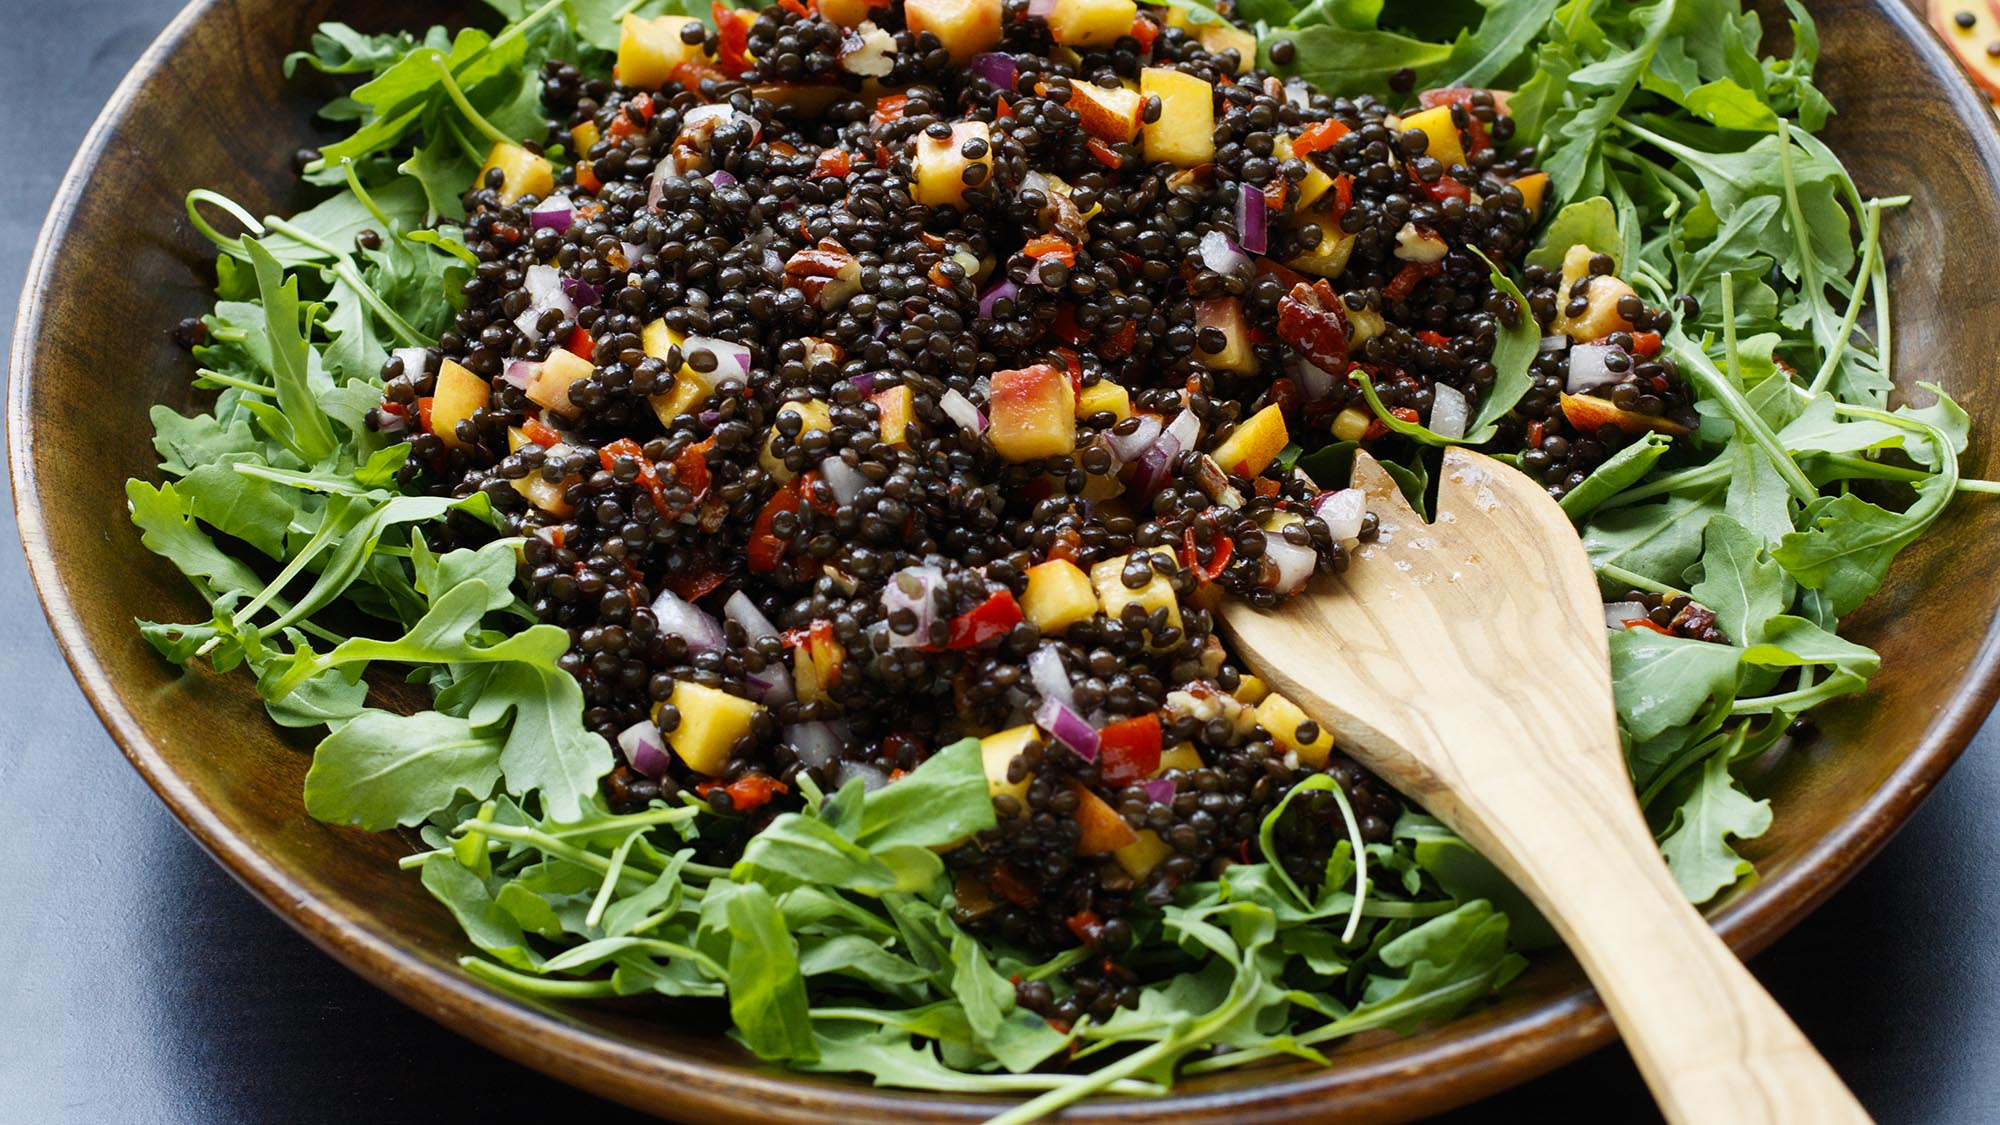 Lentil_and_peach_salad_with_tarragon_mustard_vinaigrette_2000x1125.jpg